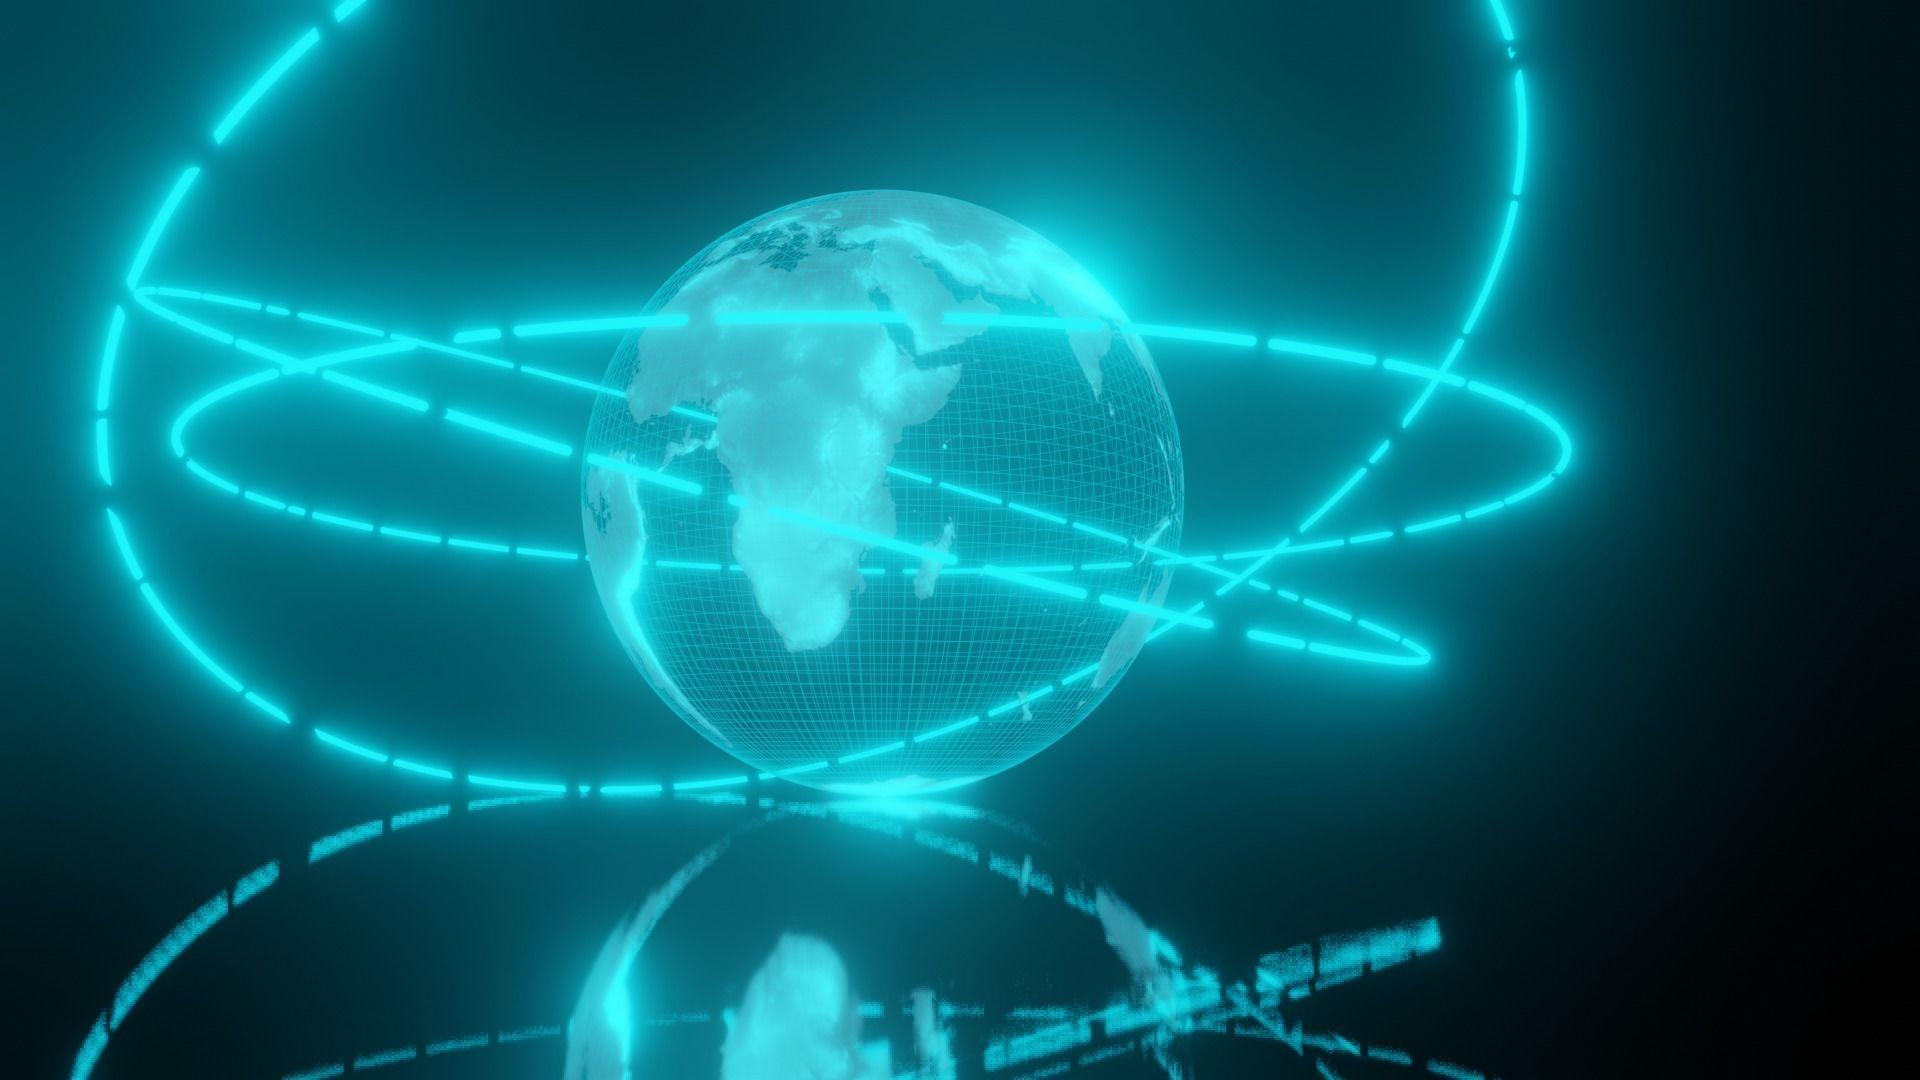 Earth hologram 3D